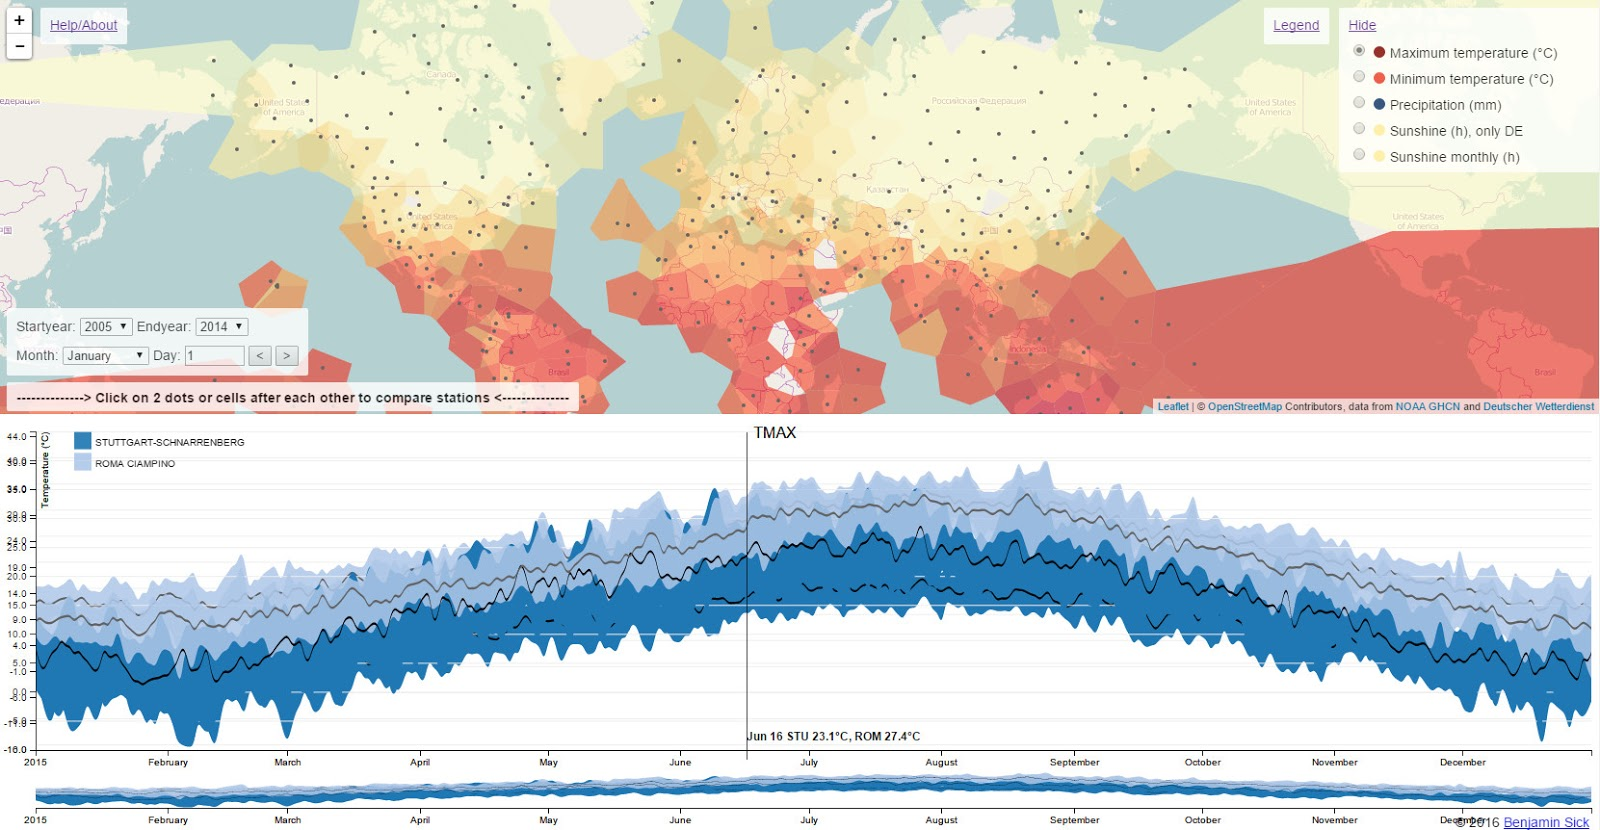 Global weather data comparison